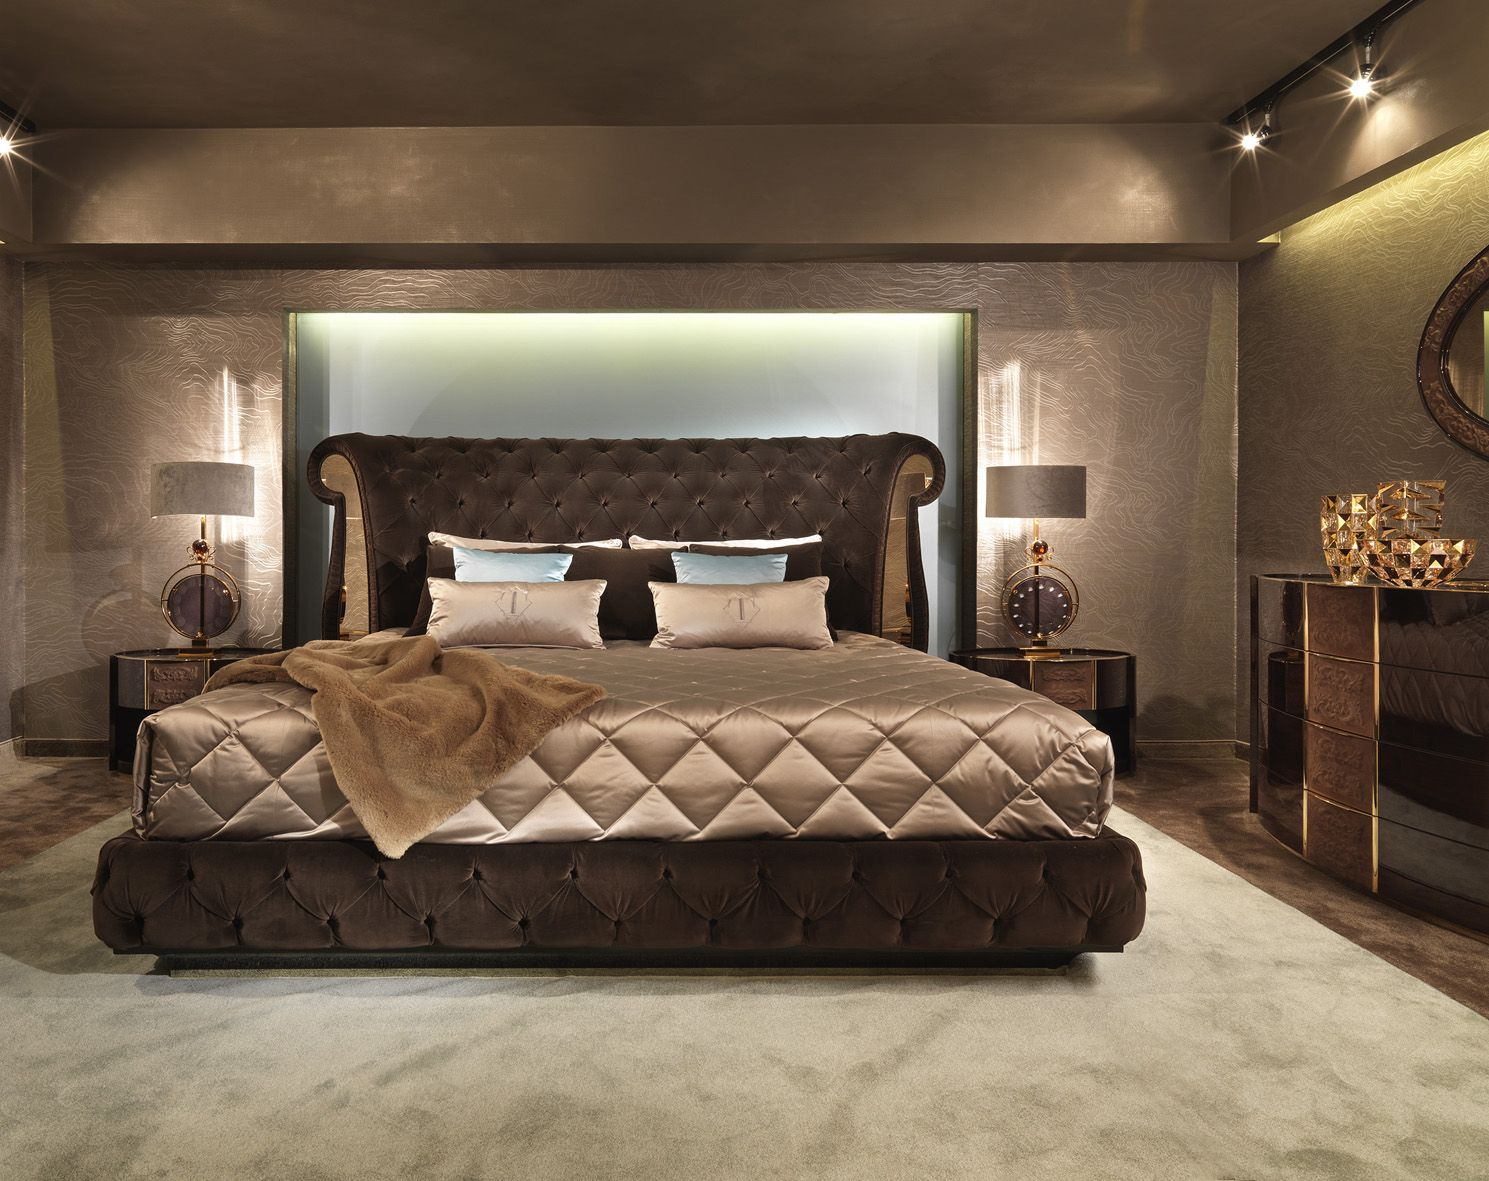 Couture bedroom turri italian luxury bed 双人床 pinterest